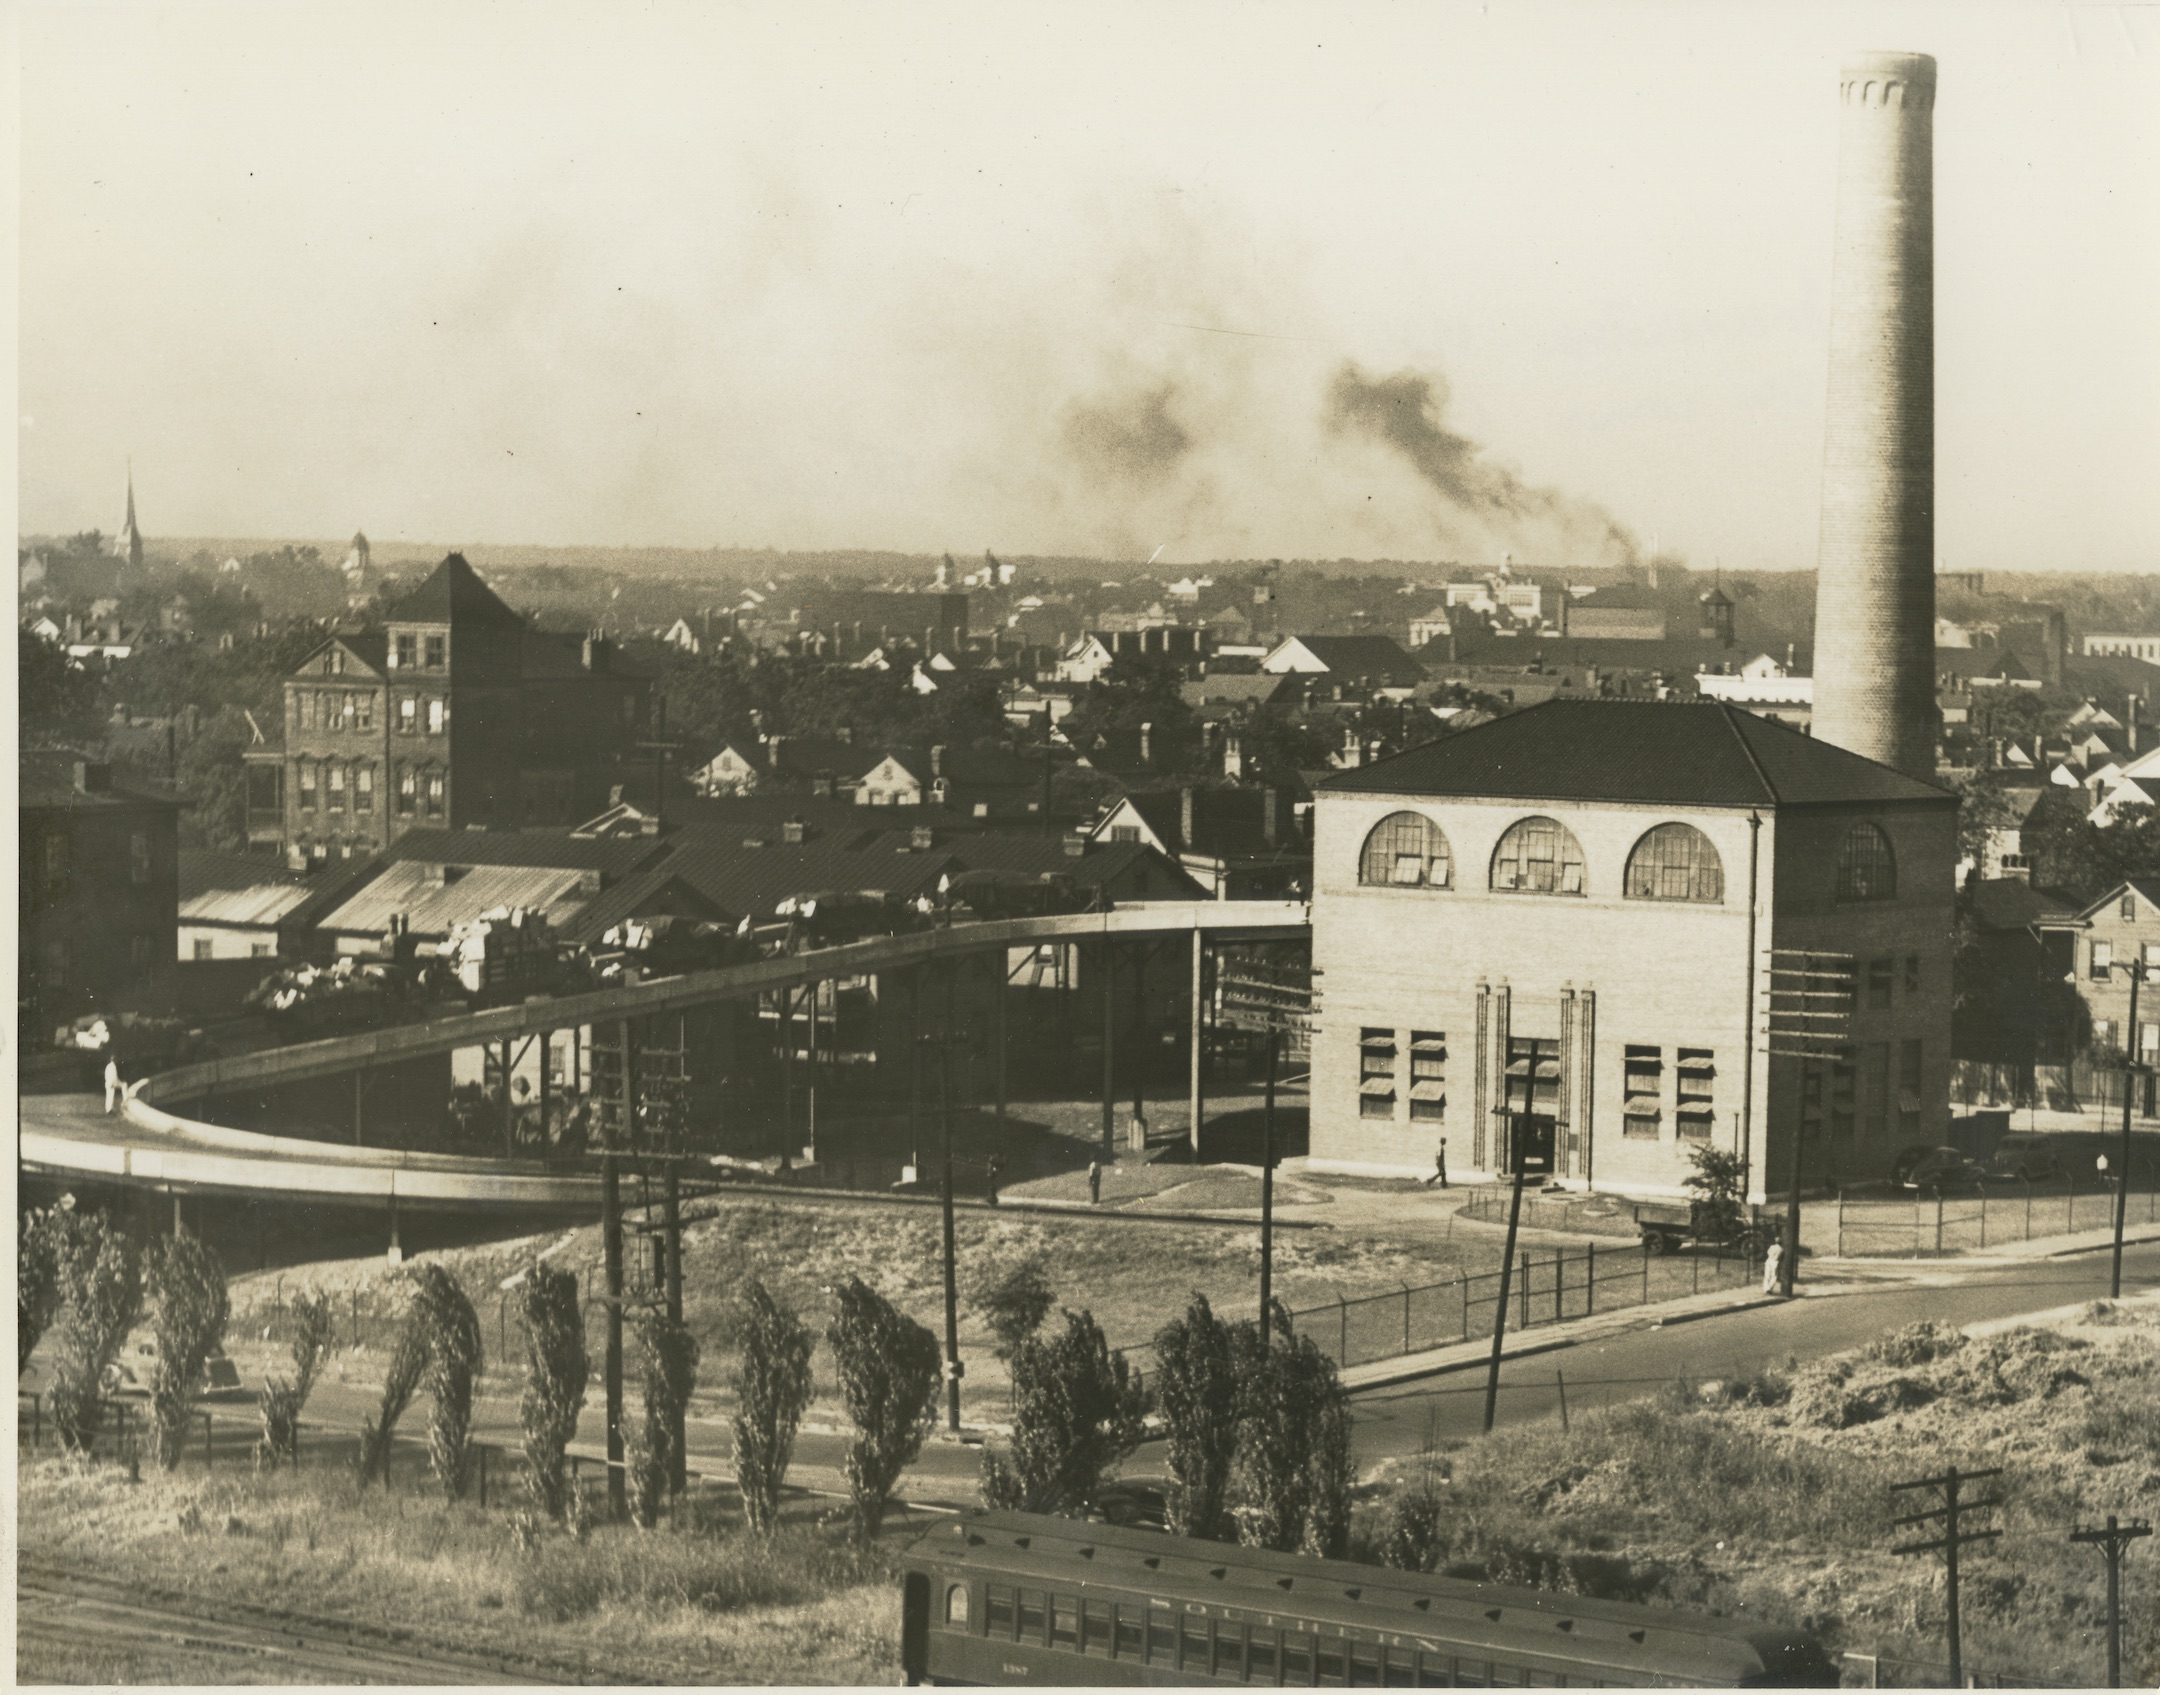 A Trashy History of Charleston's Dumps and Incinerators